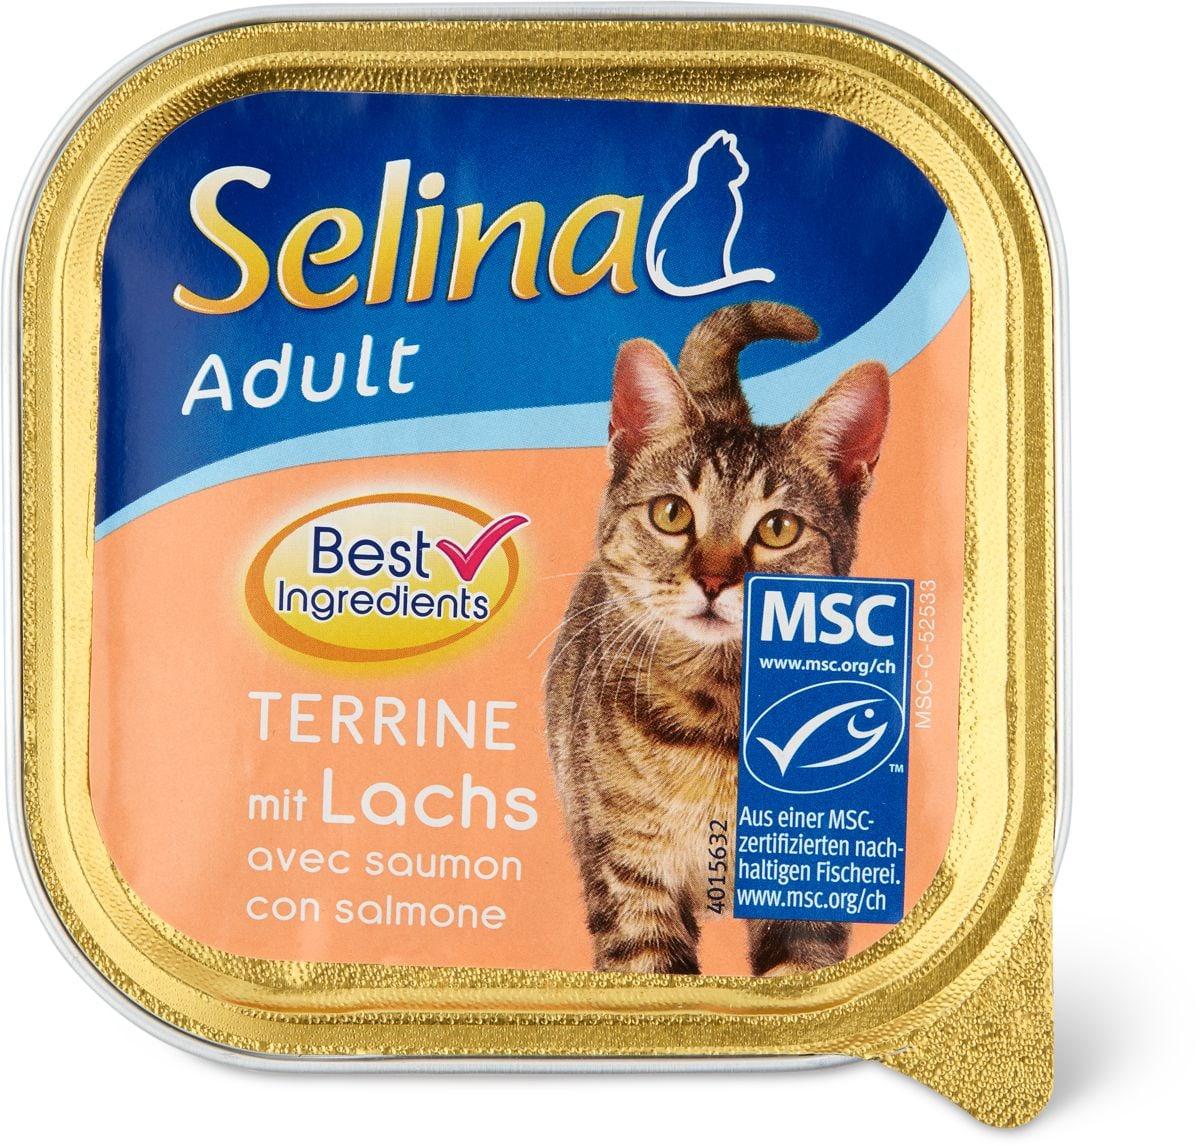 Selina MSC adult Terrine salmone